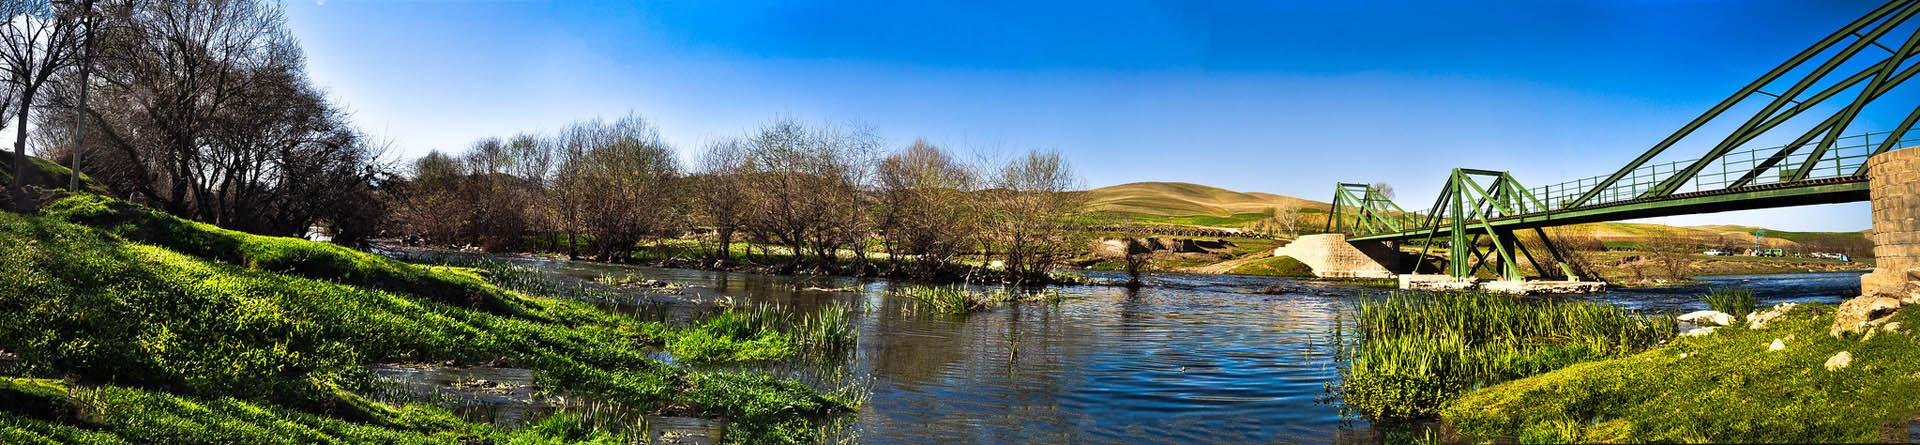 Kermanshah Province-Beautiful Nature